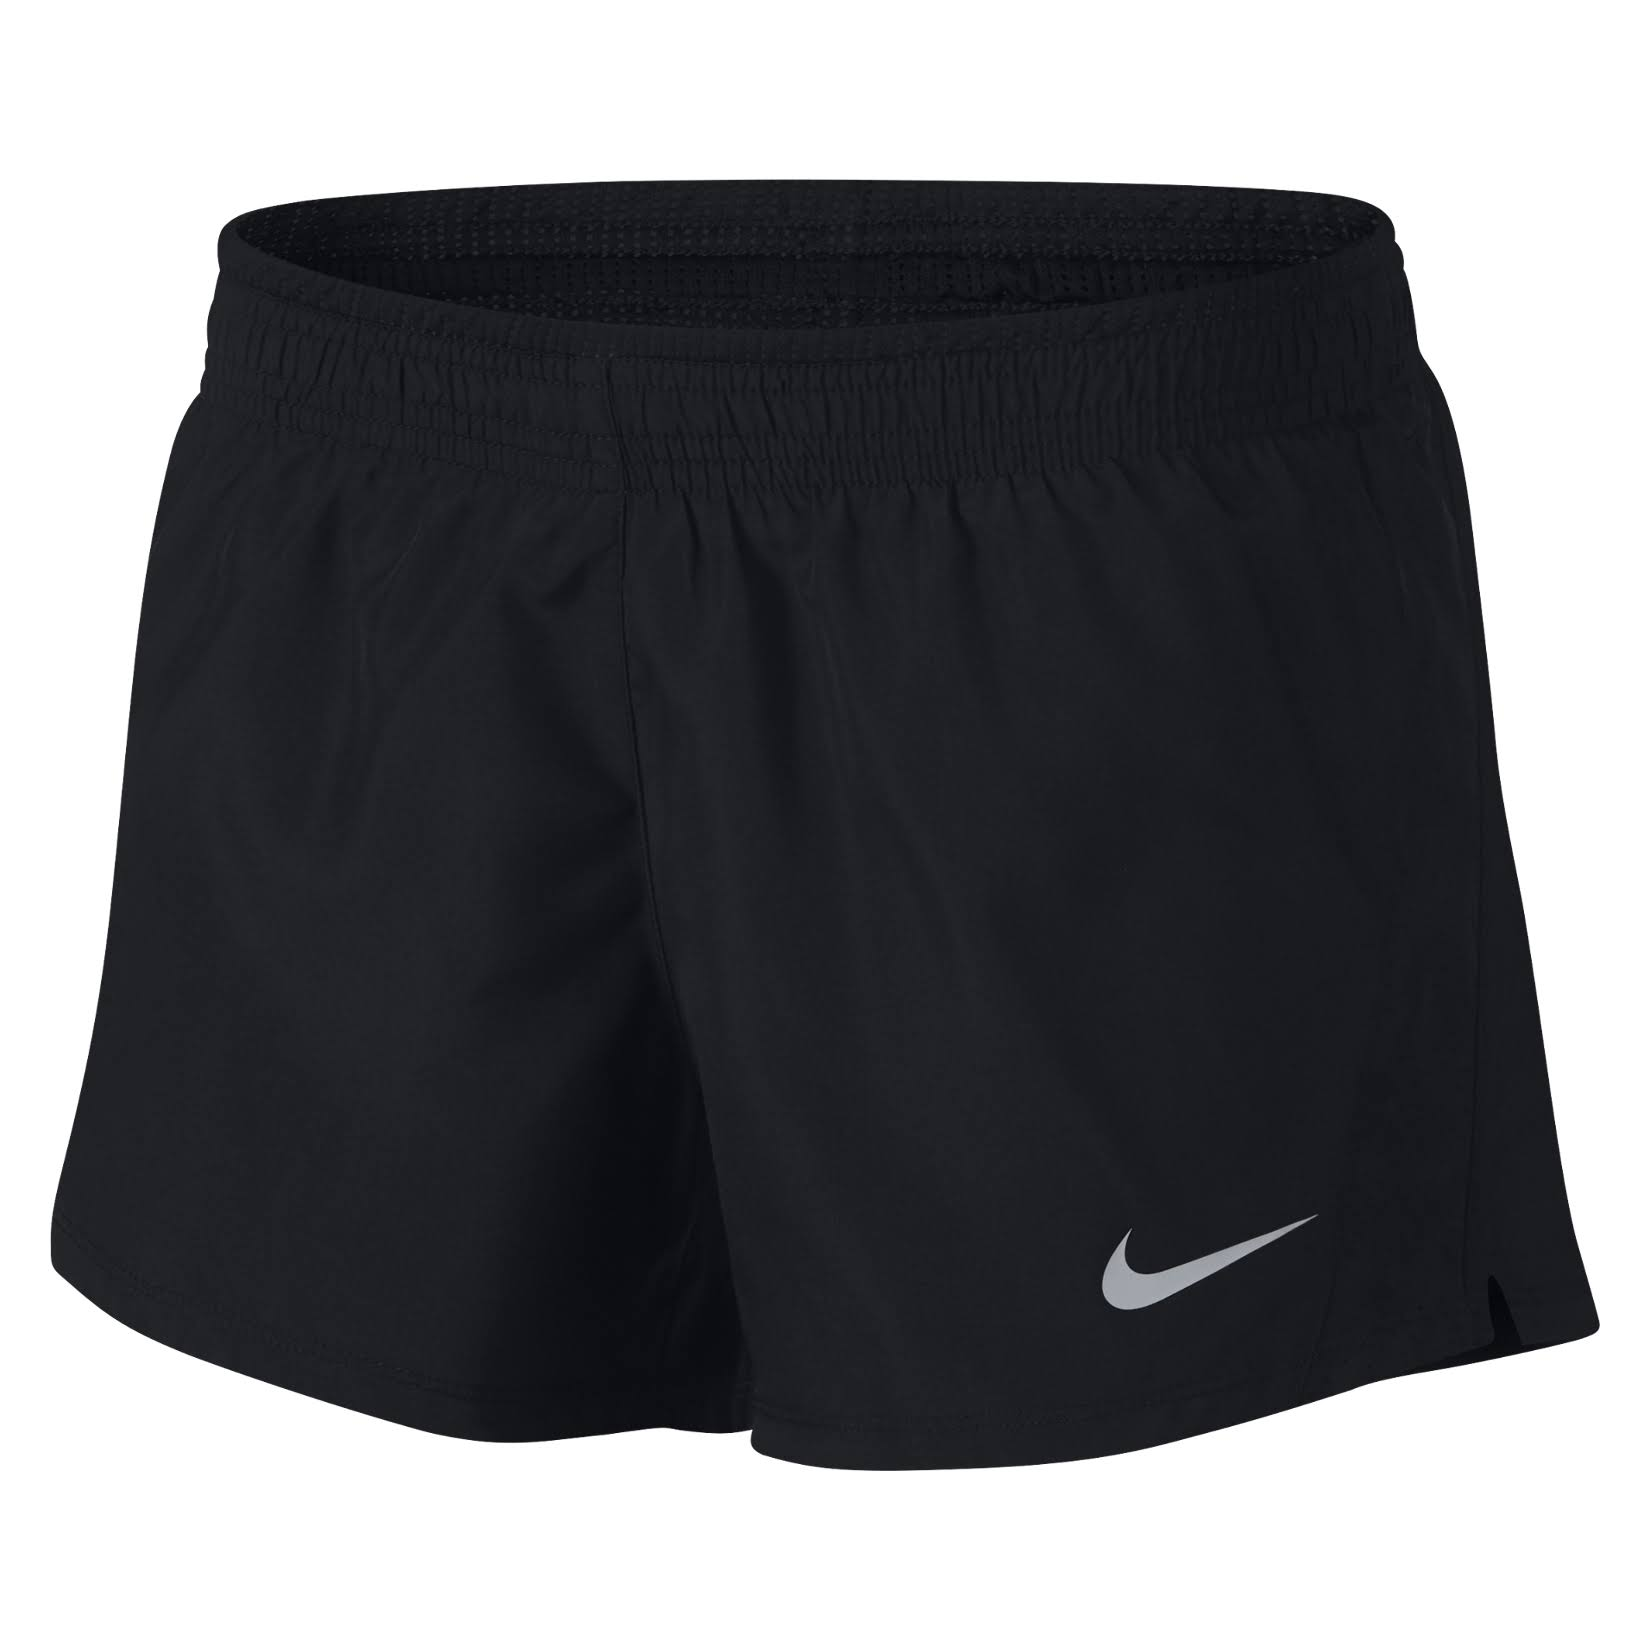 Nike Womens 10K Running Short Black Black Black Wolf Grey